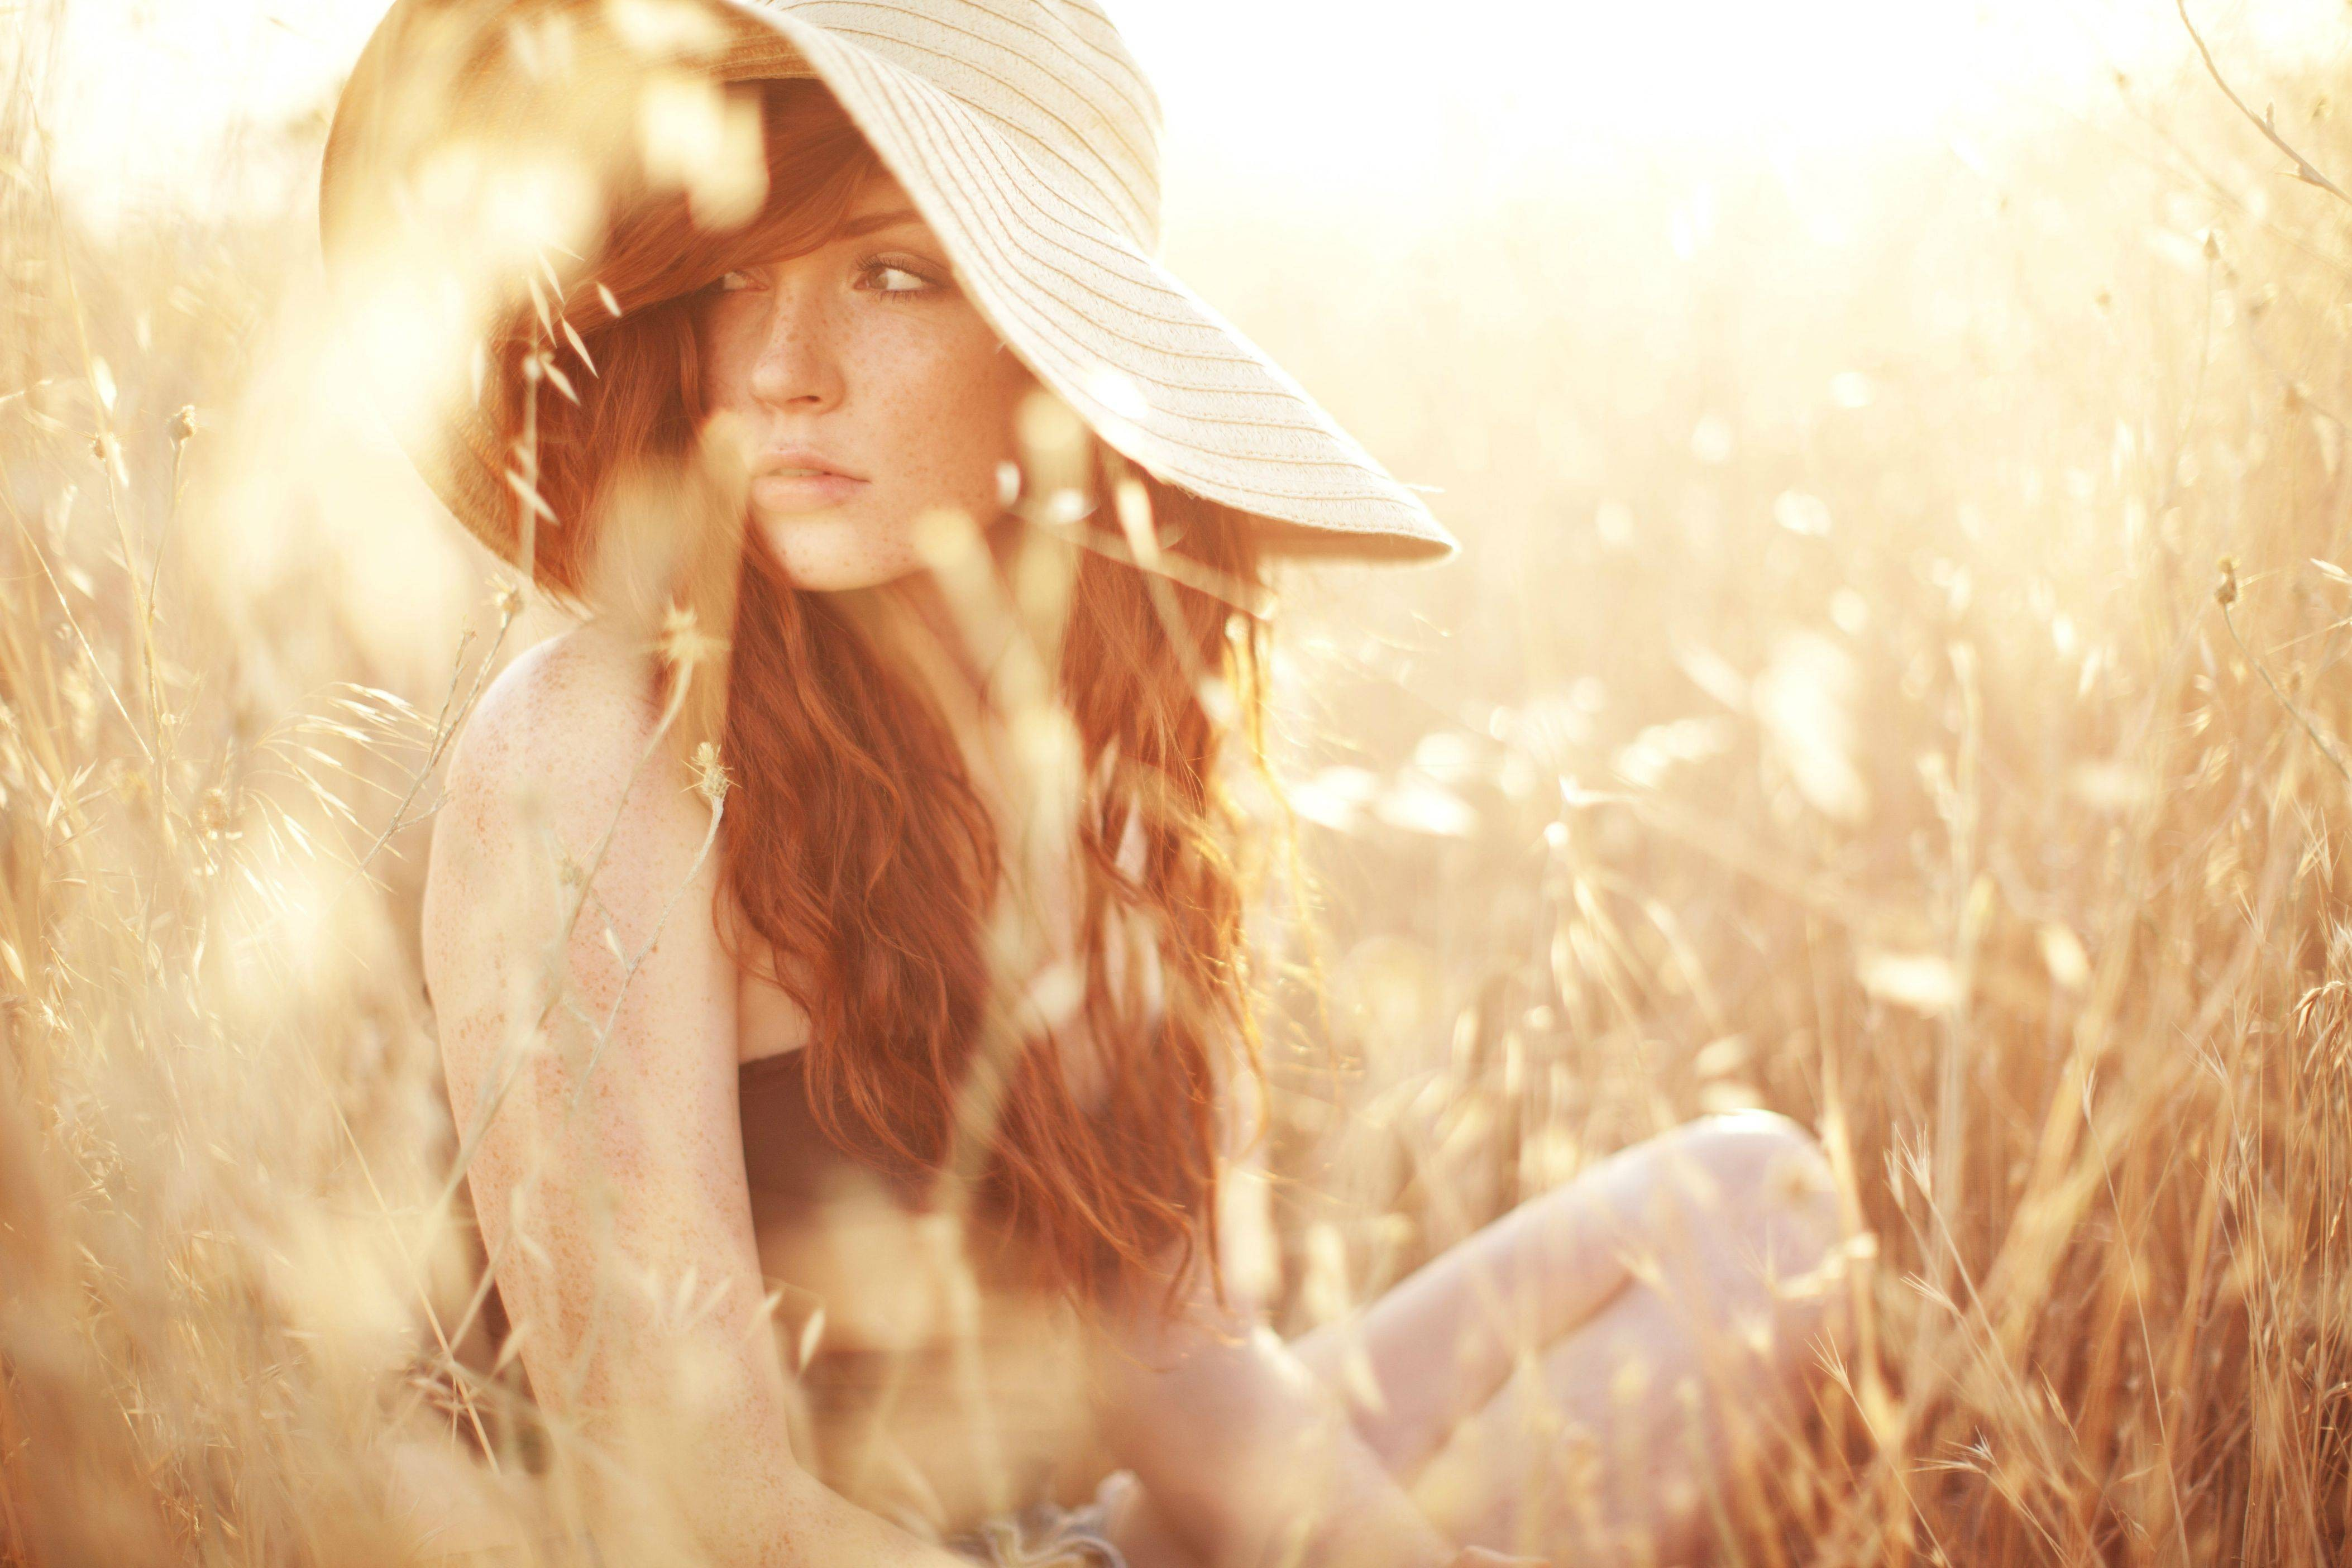 field women outdoors outdoors model redhead women long hair